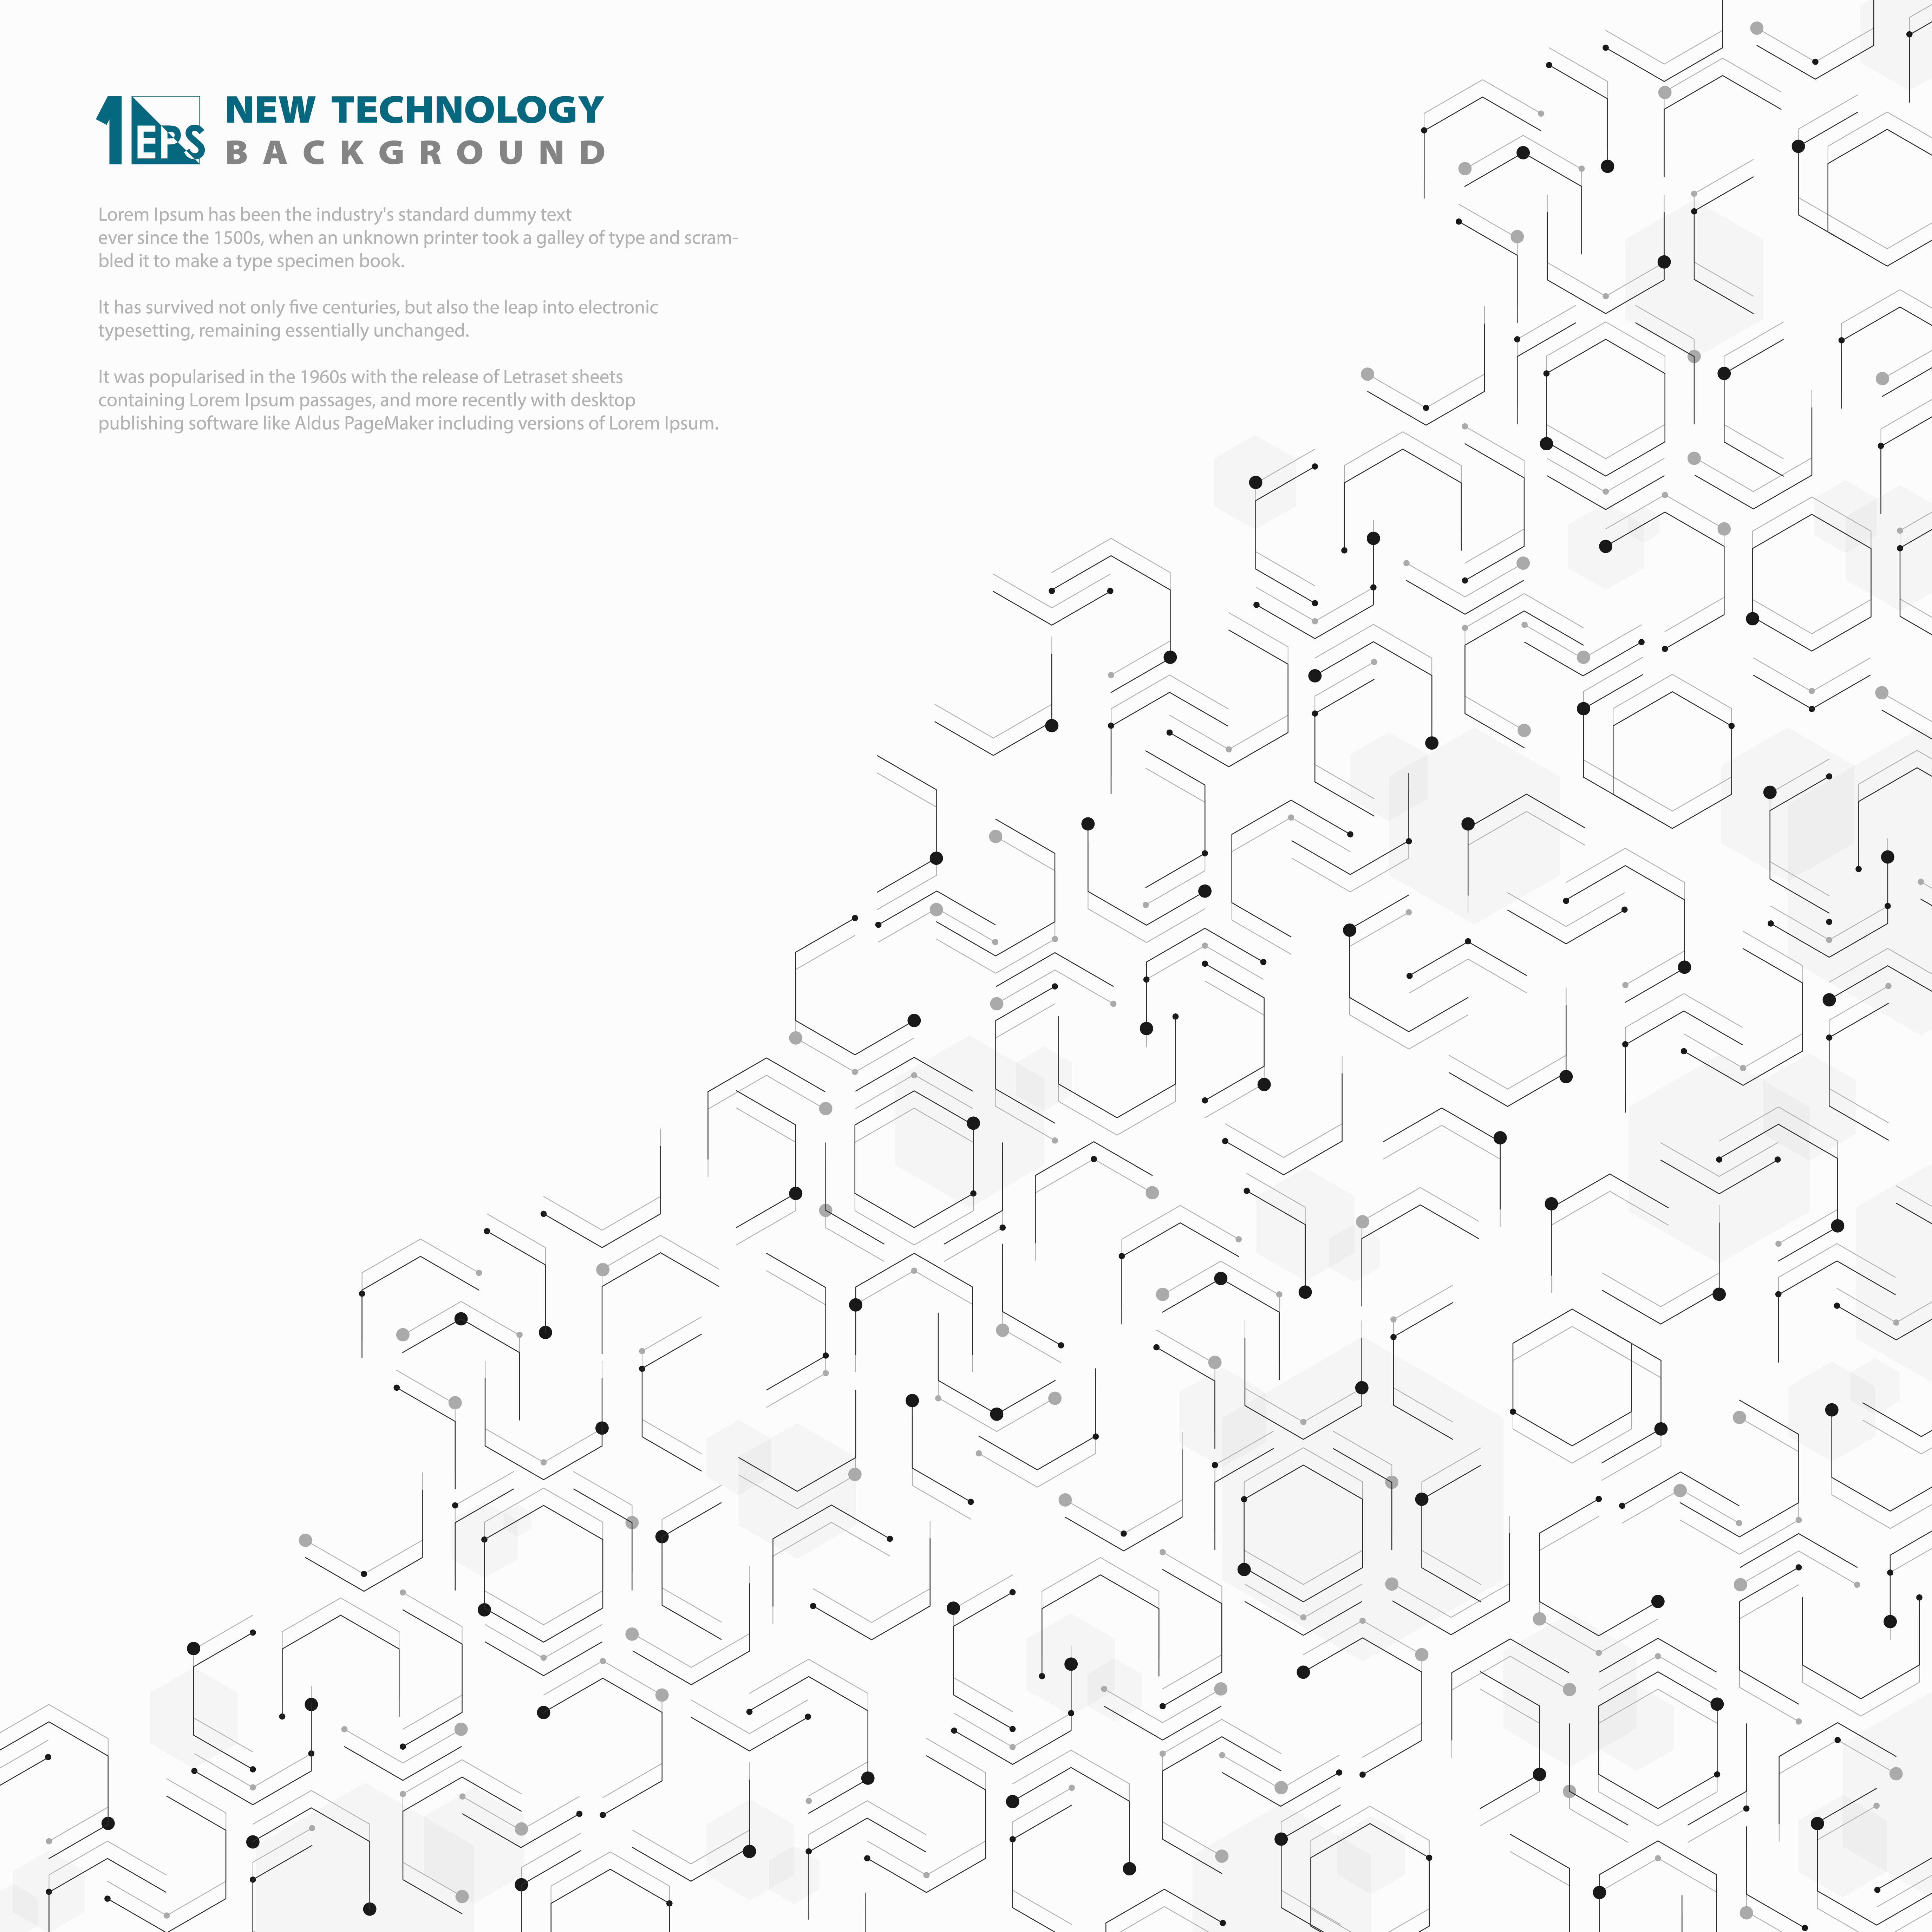 Abstract Hexagonal Geometric Technology Pattern Design White